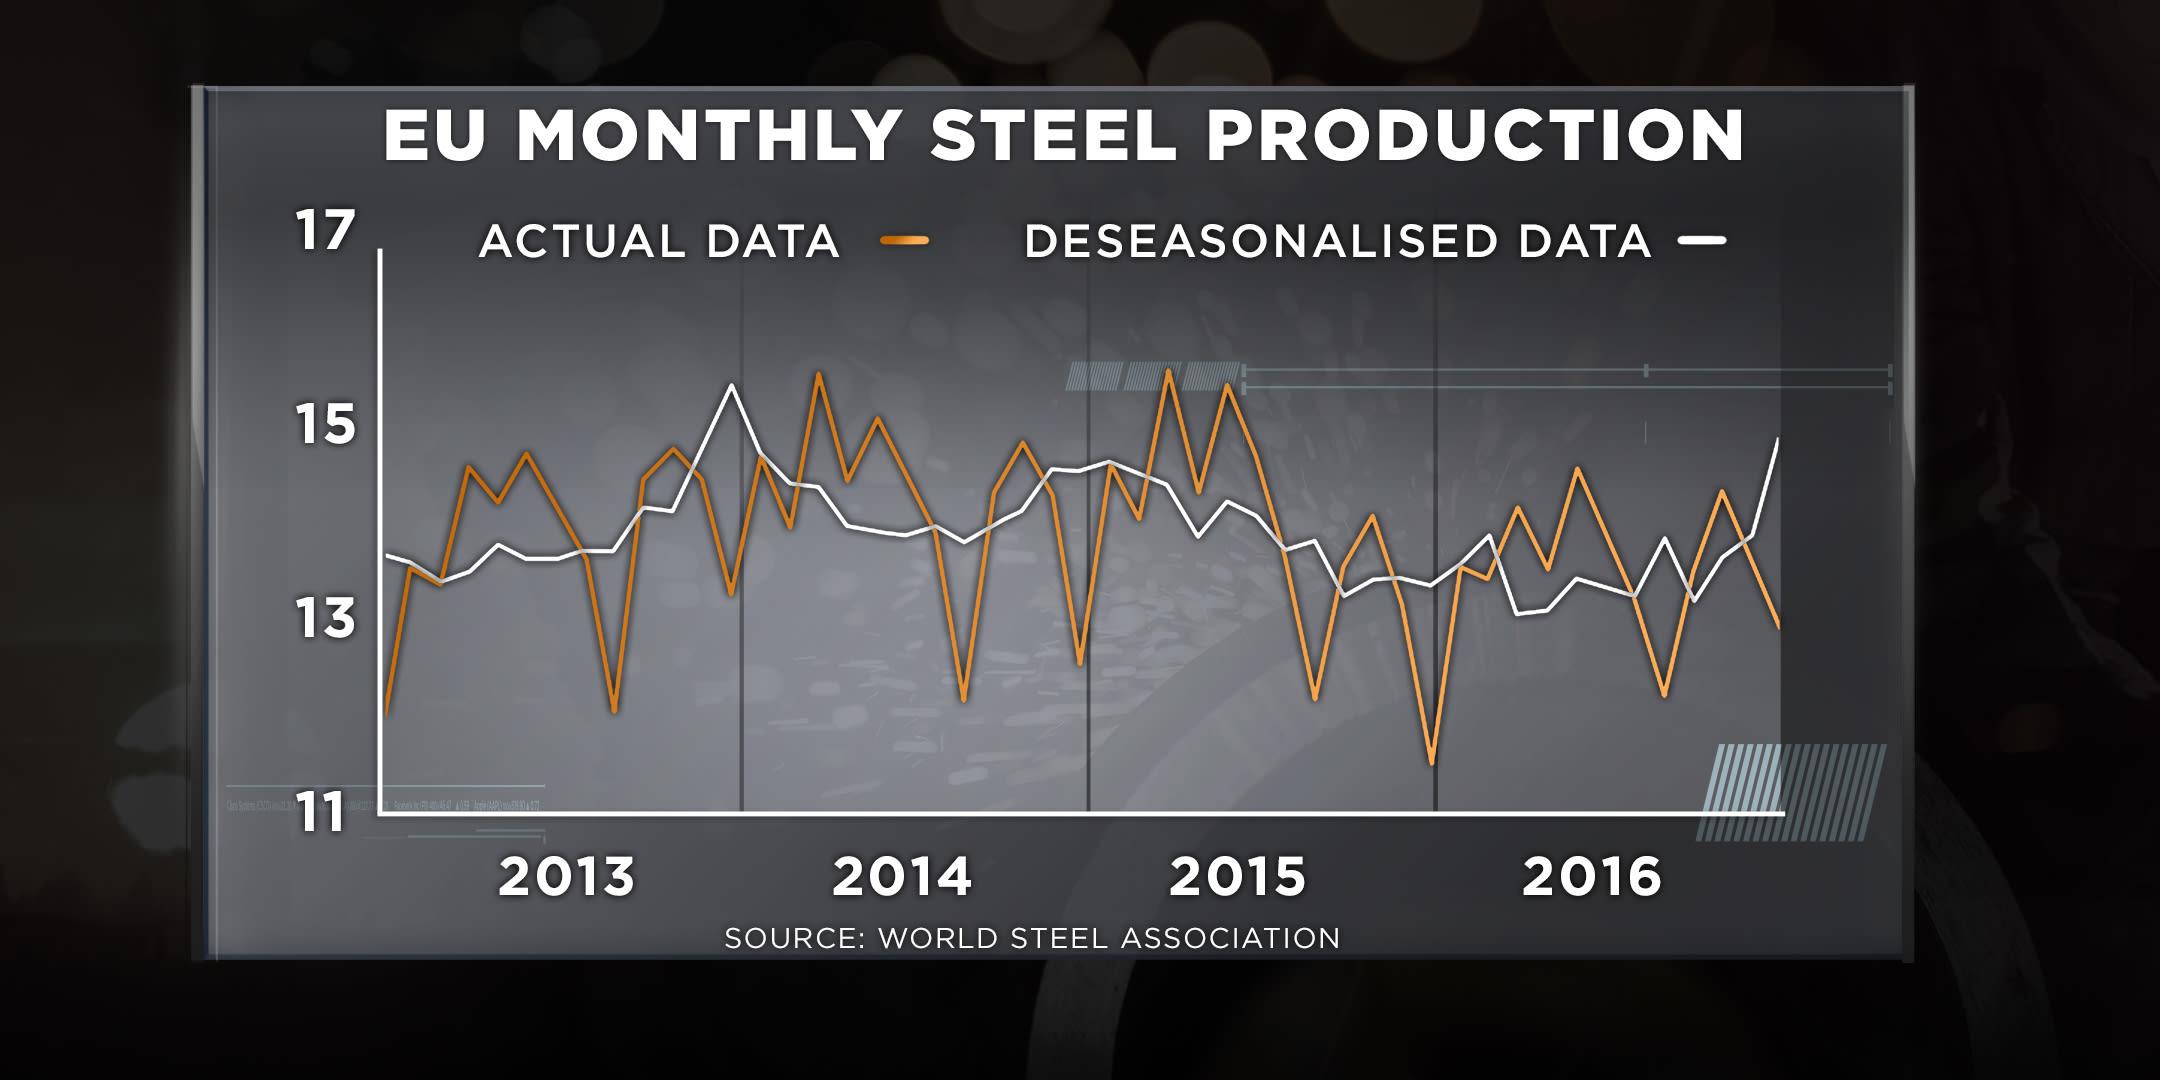 EU steel production